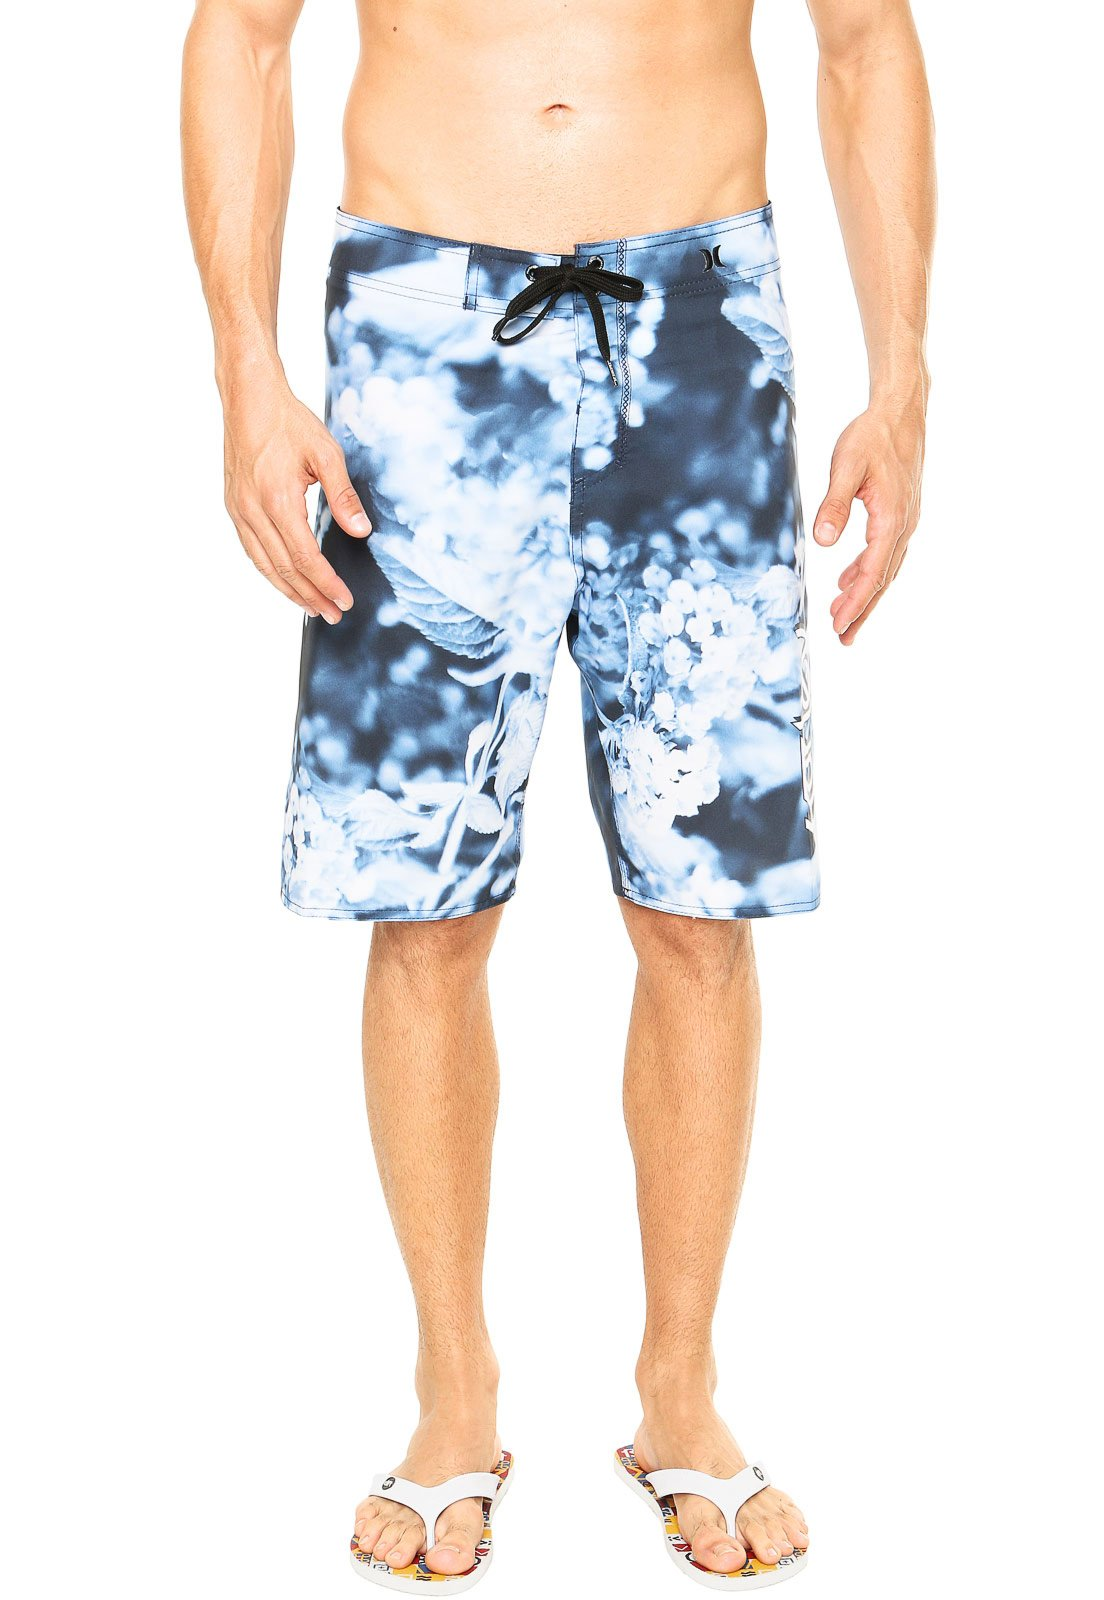 Bermuda Hurley Original Azul - Compre Agora  cf4d6e0a669